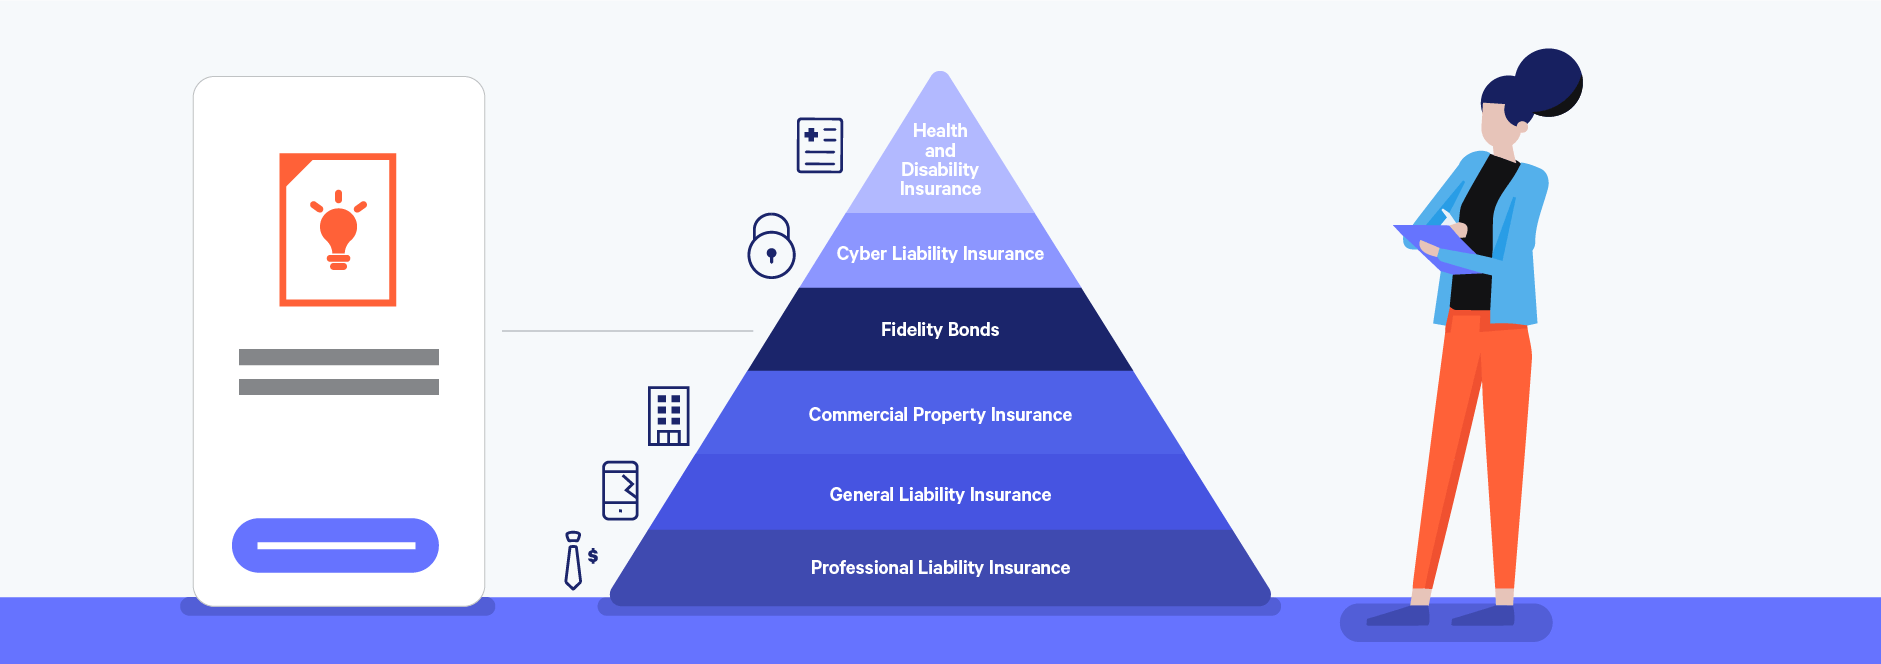 fidelity bonds as a key freelance insurance policy illustration